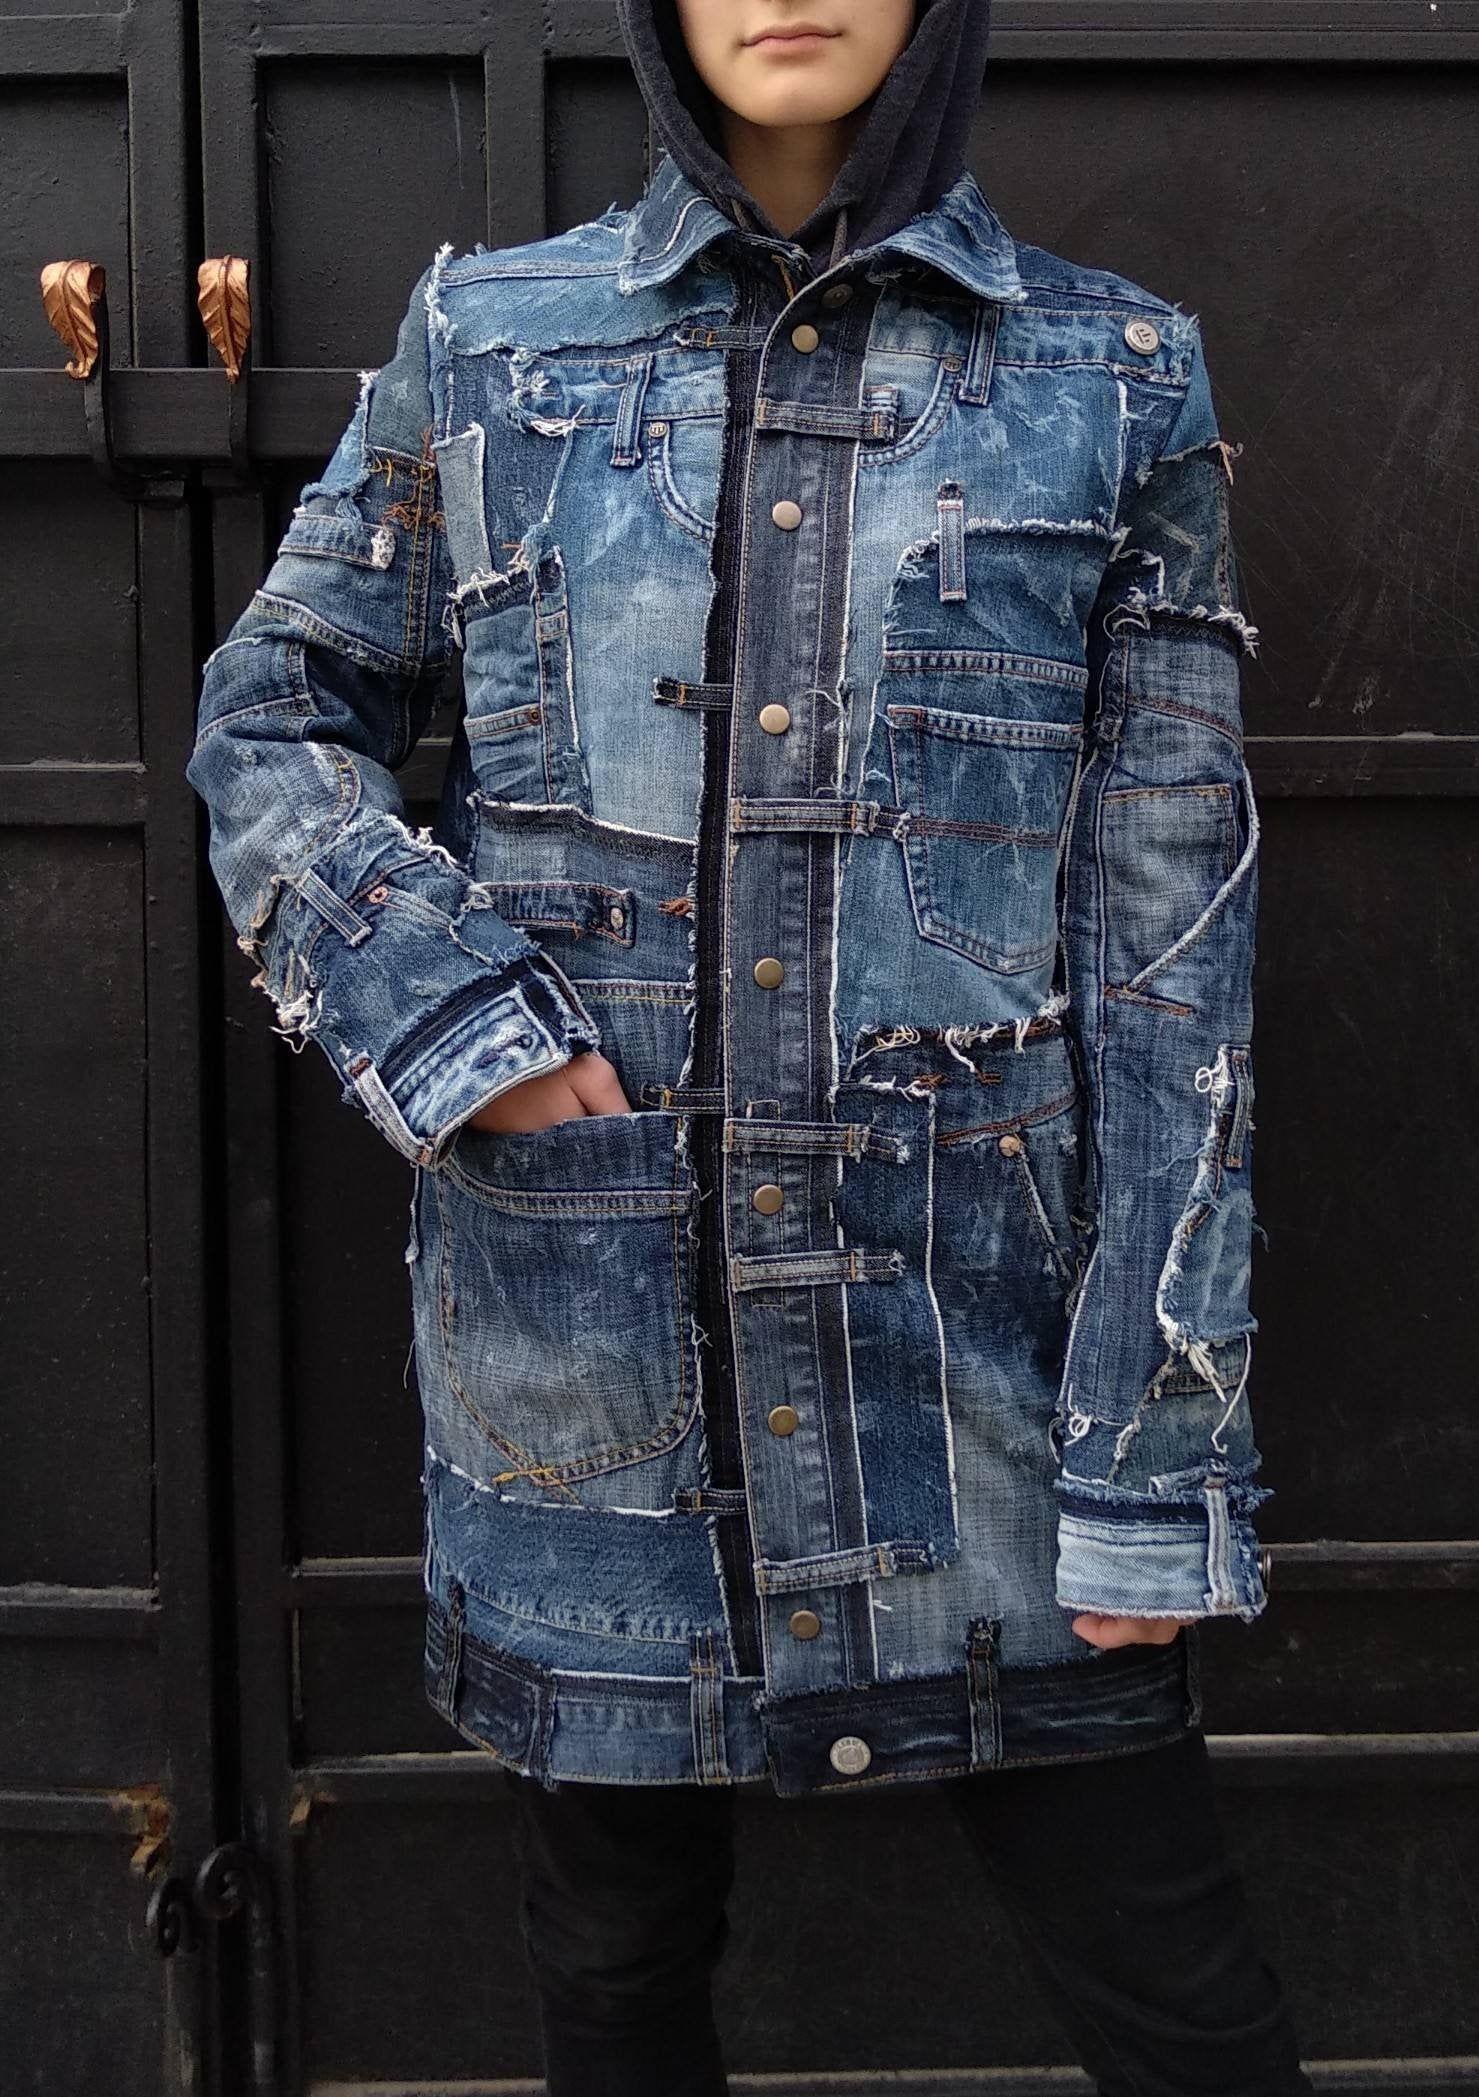 Steampunk Jeans Jacket From Recycled Denim With Pockets For Etsy Odezhda Moda Dzhinsy [ 2097 x 1479 Pixel ]